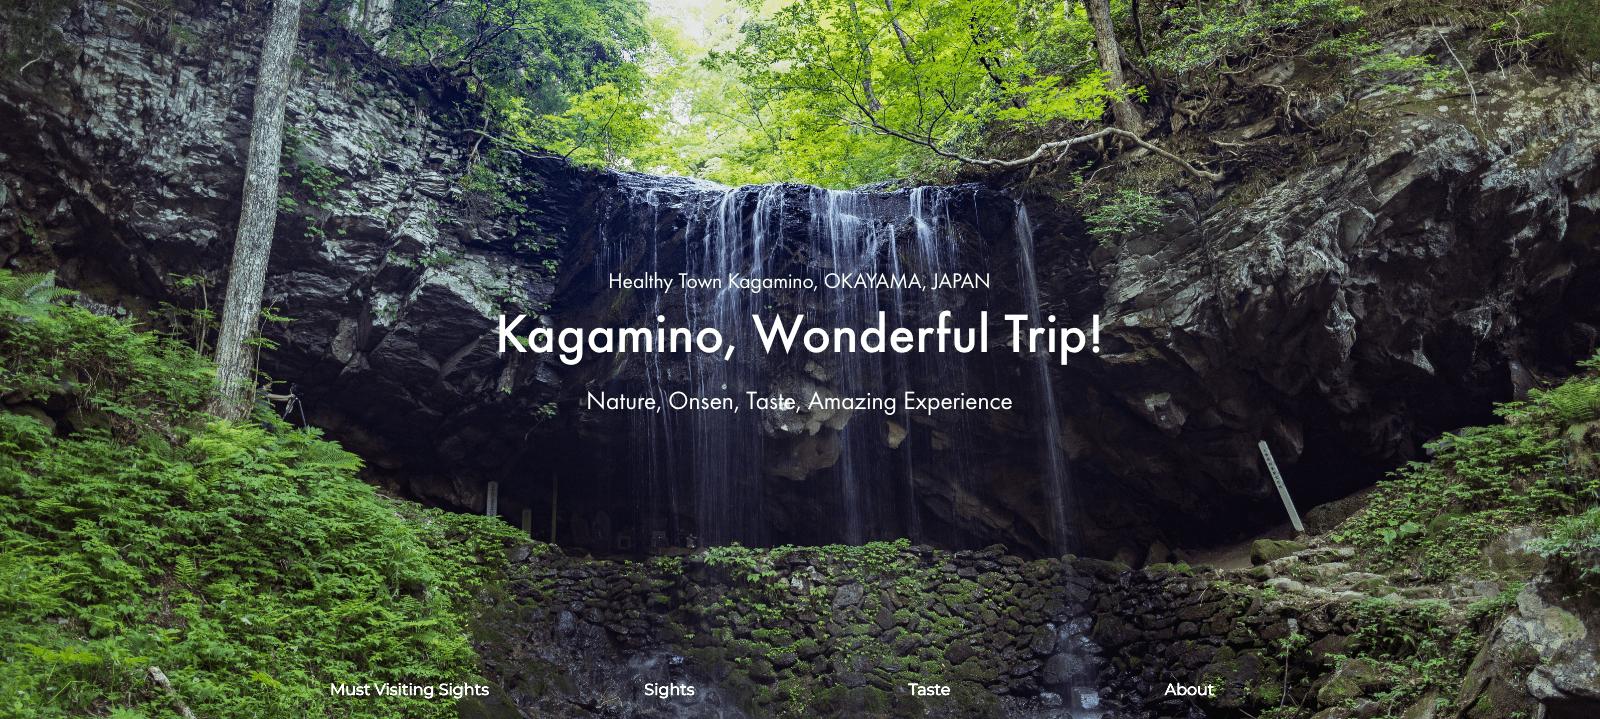 kagamino_wonderful_trip_01